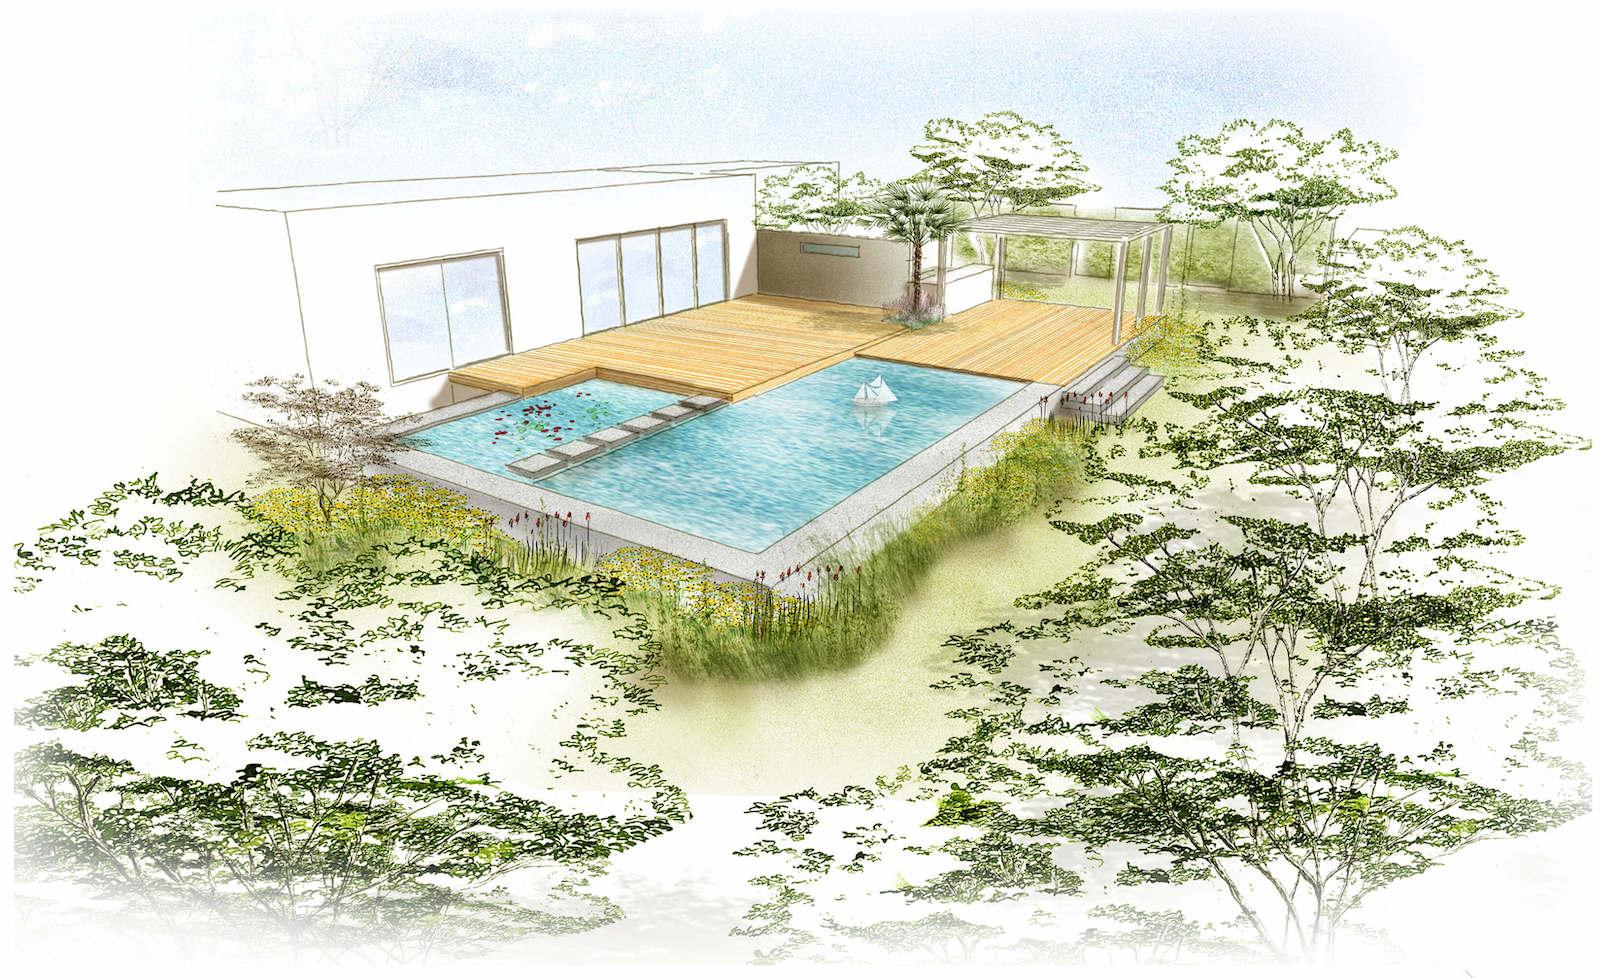 Hainmüller Gartengestaltung 3 -K